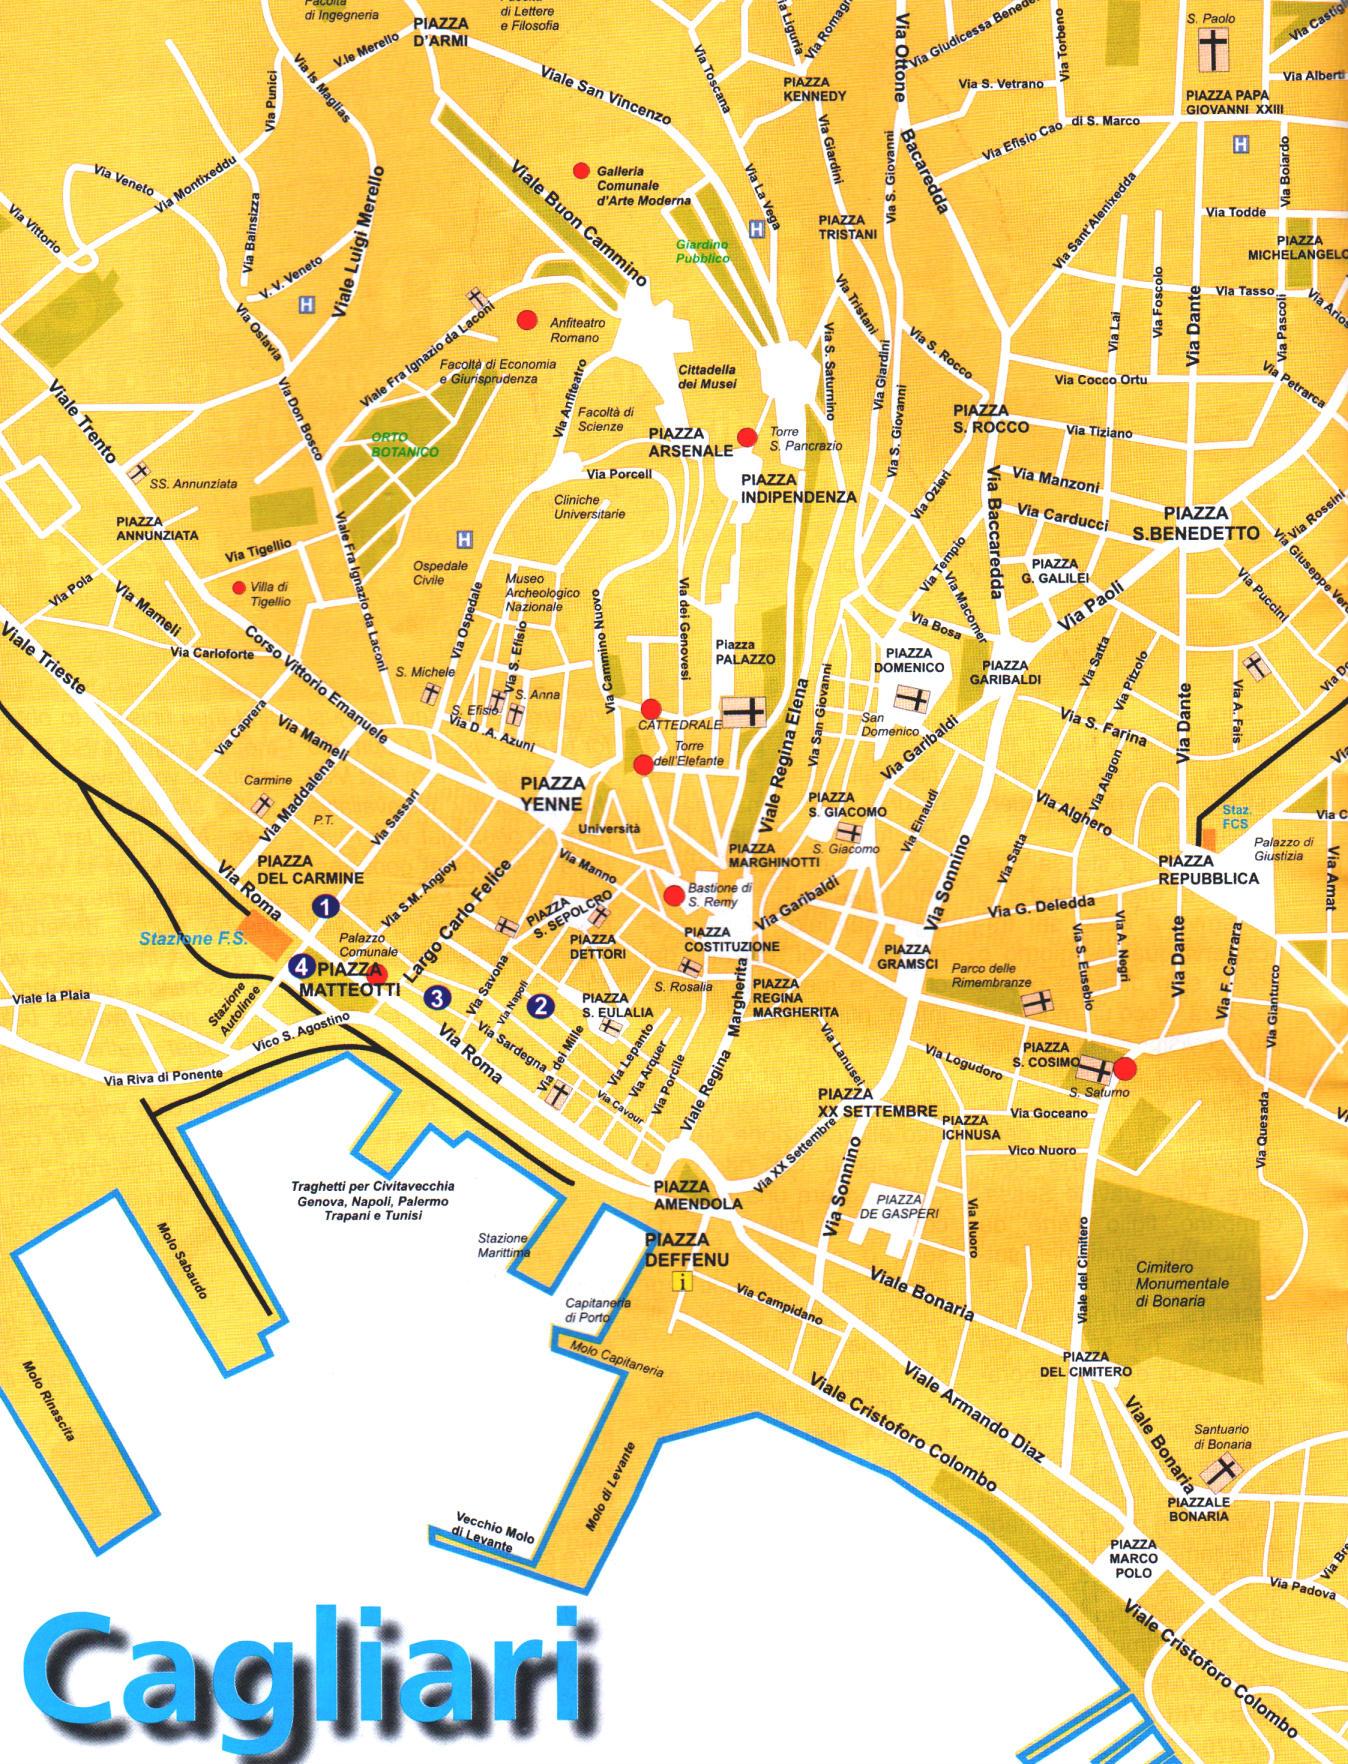 recensioni evasioni cagliari map - photo#5